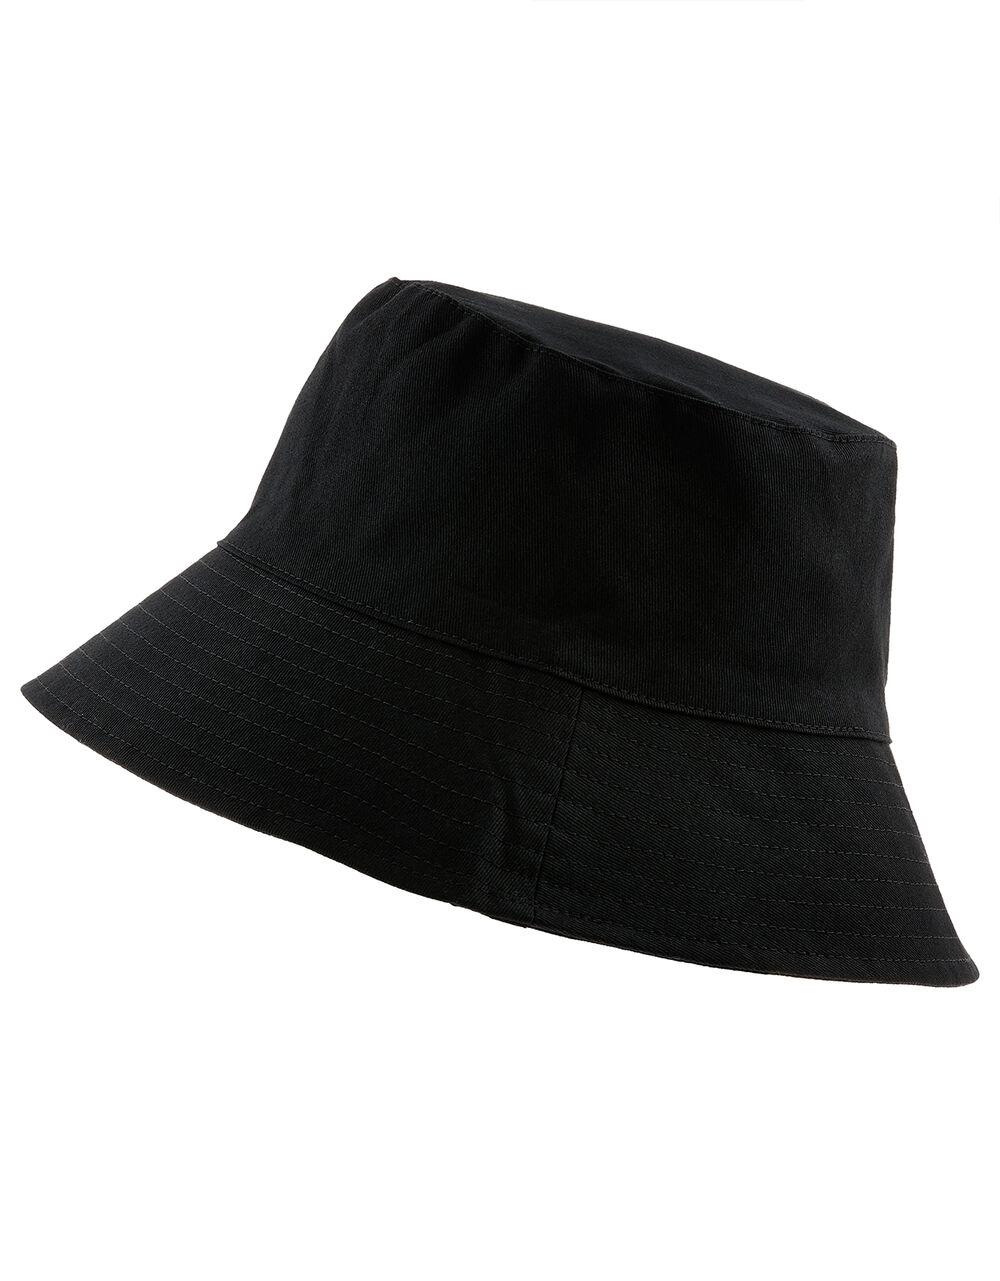 Utility Bucket Hat in Cotton Twill, Black (BLACK), large